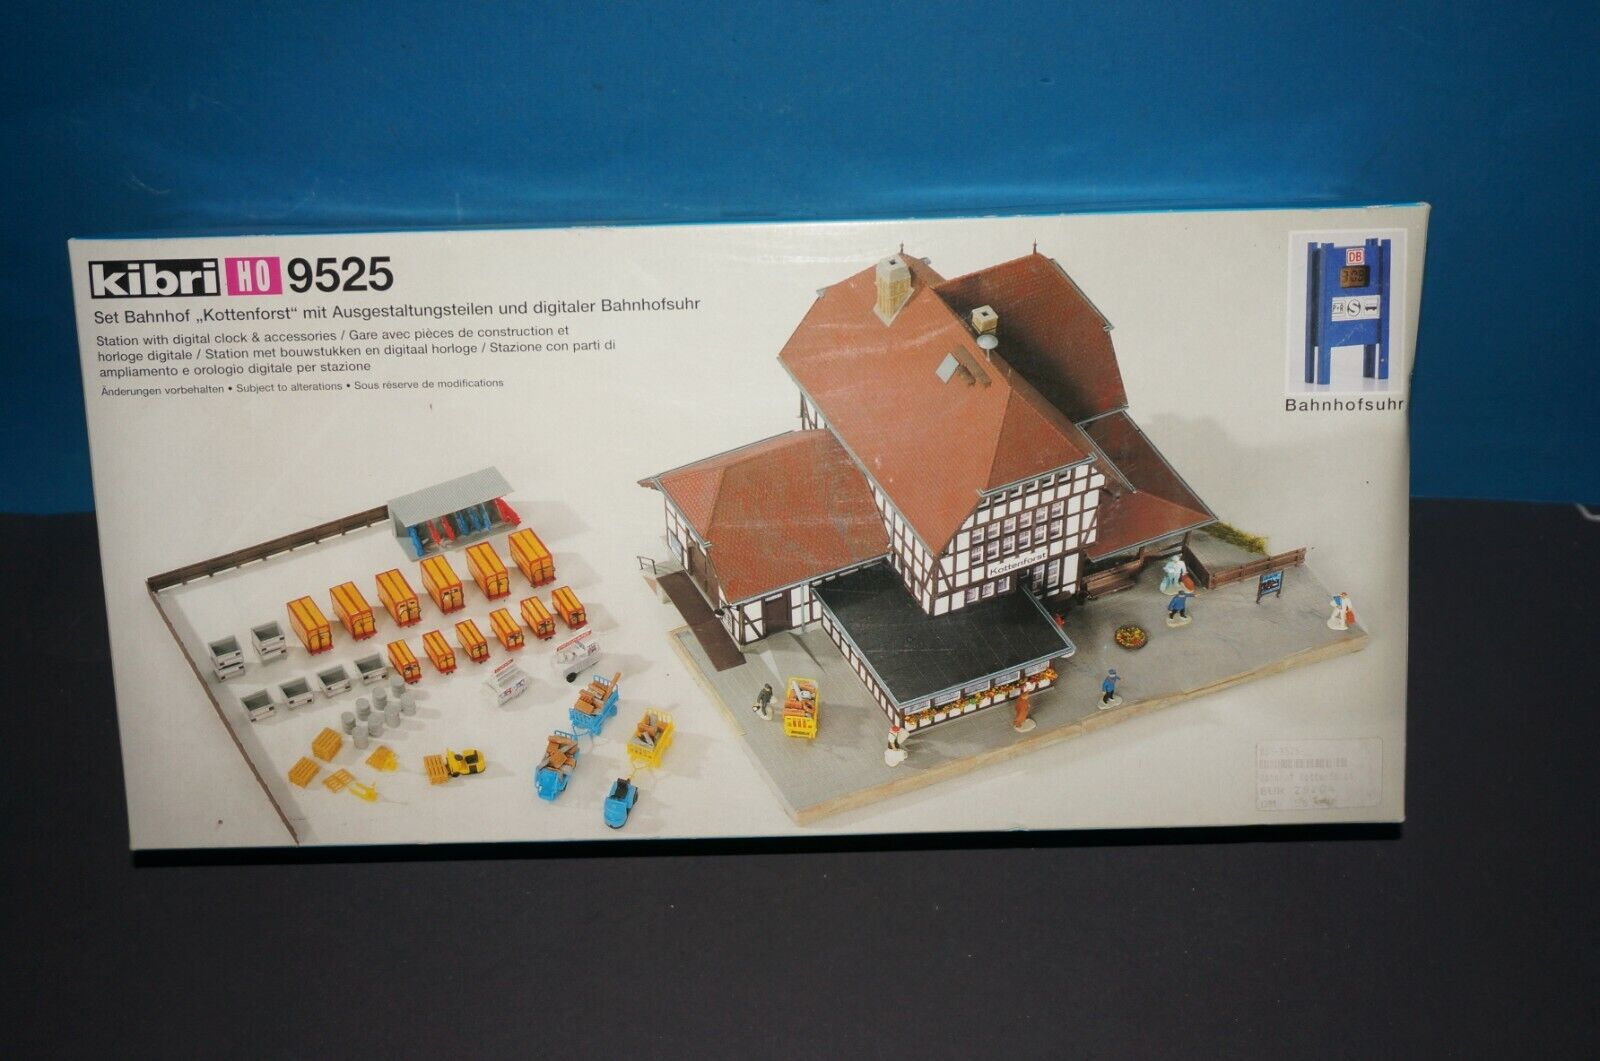 RF12] Kibri H0 No. 9525 Railway Station Kottenforst Kit Box